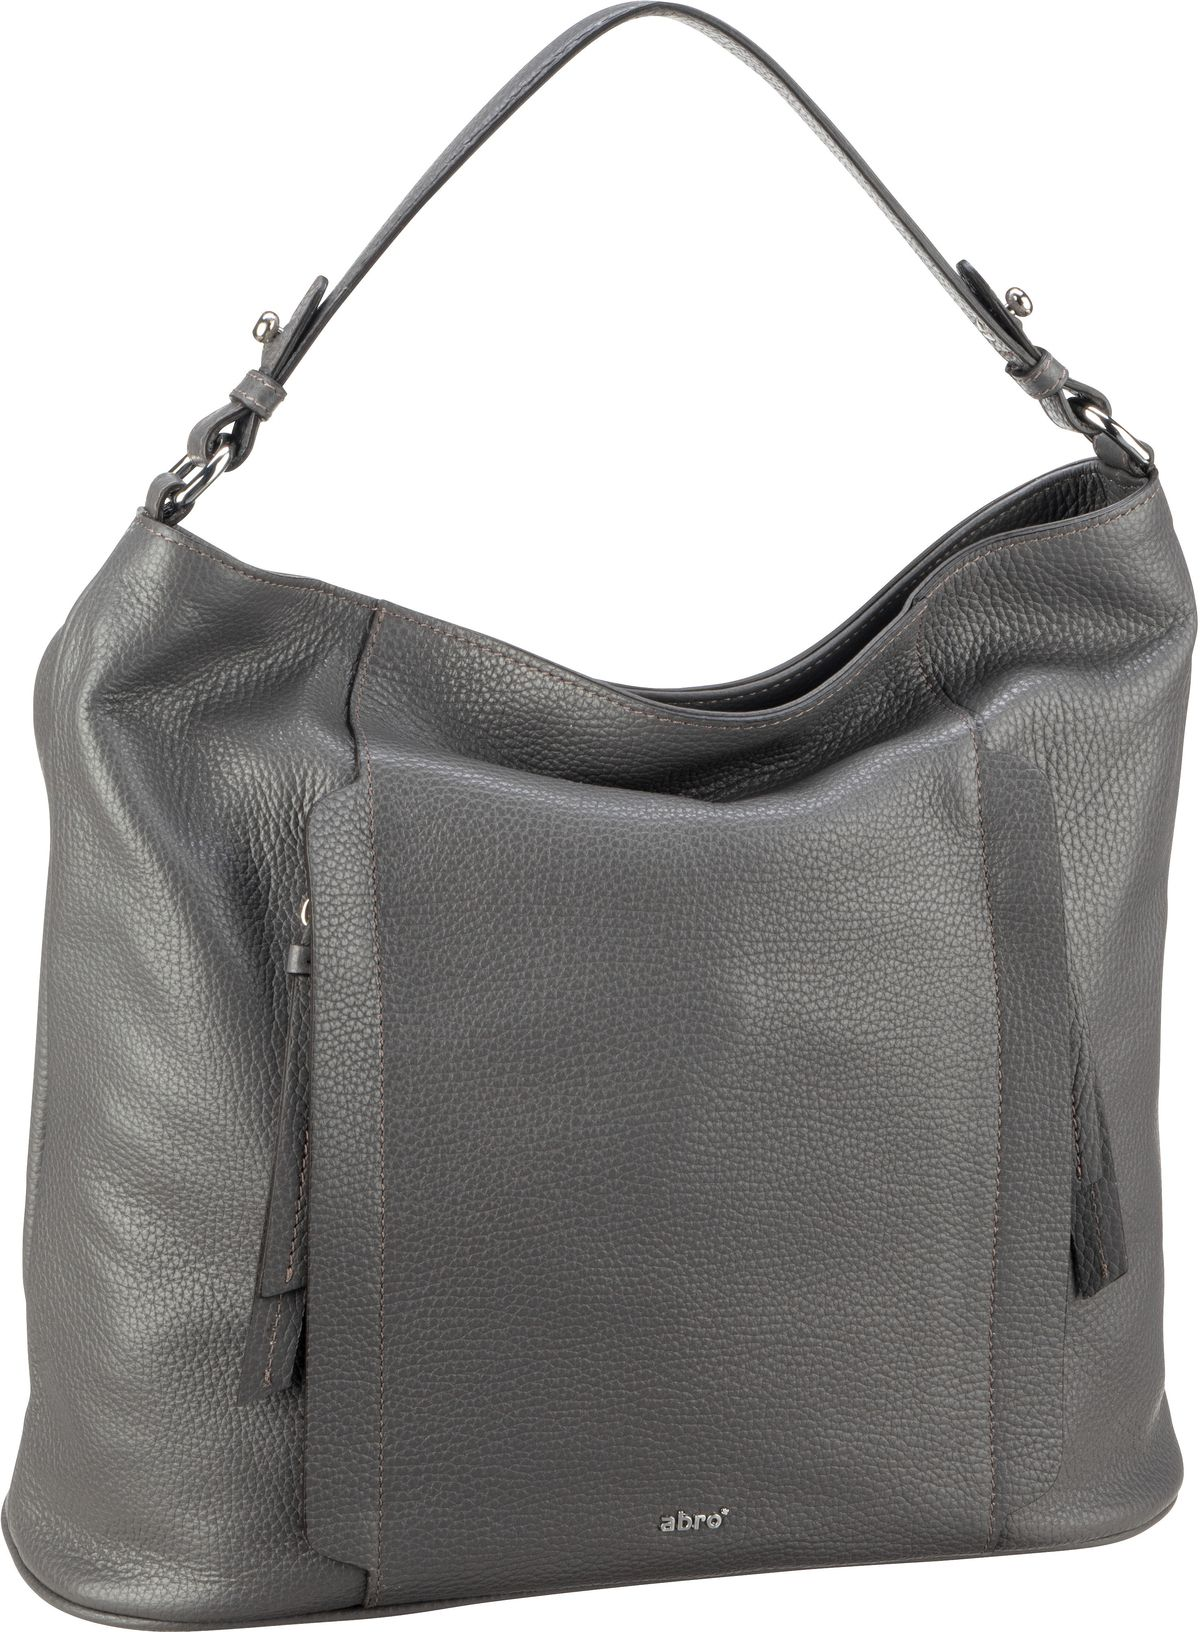 Handtasche Calf Adria 28628 Dark Grey